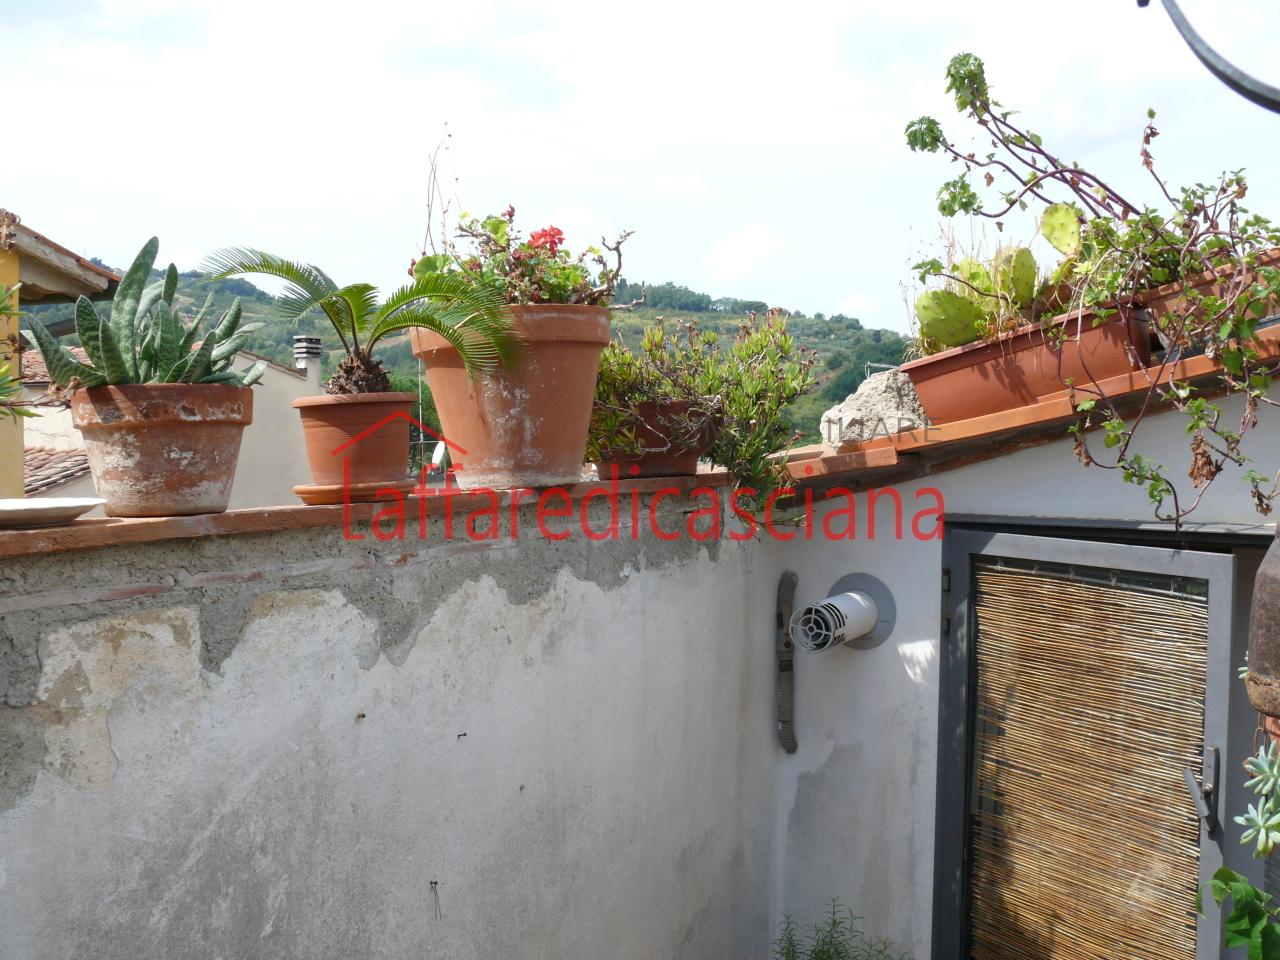 Attico in vendita - Casciana Terme, Casciana Terme Lari